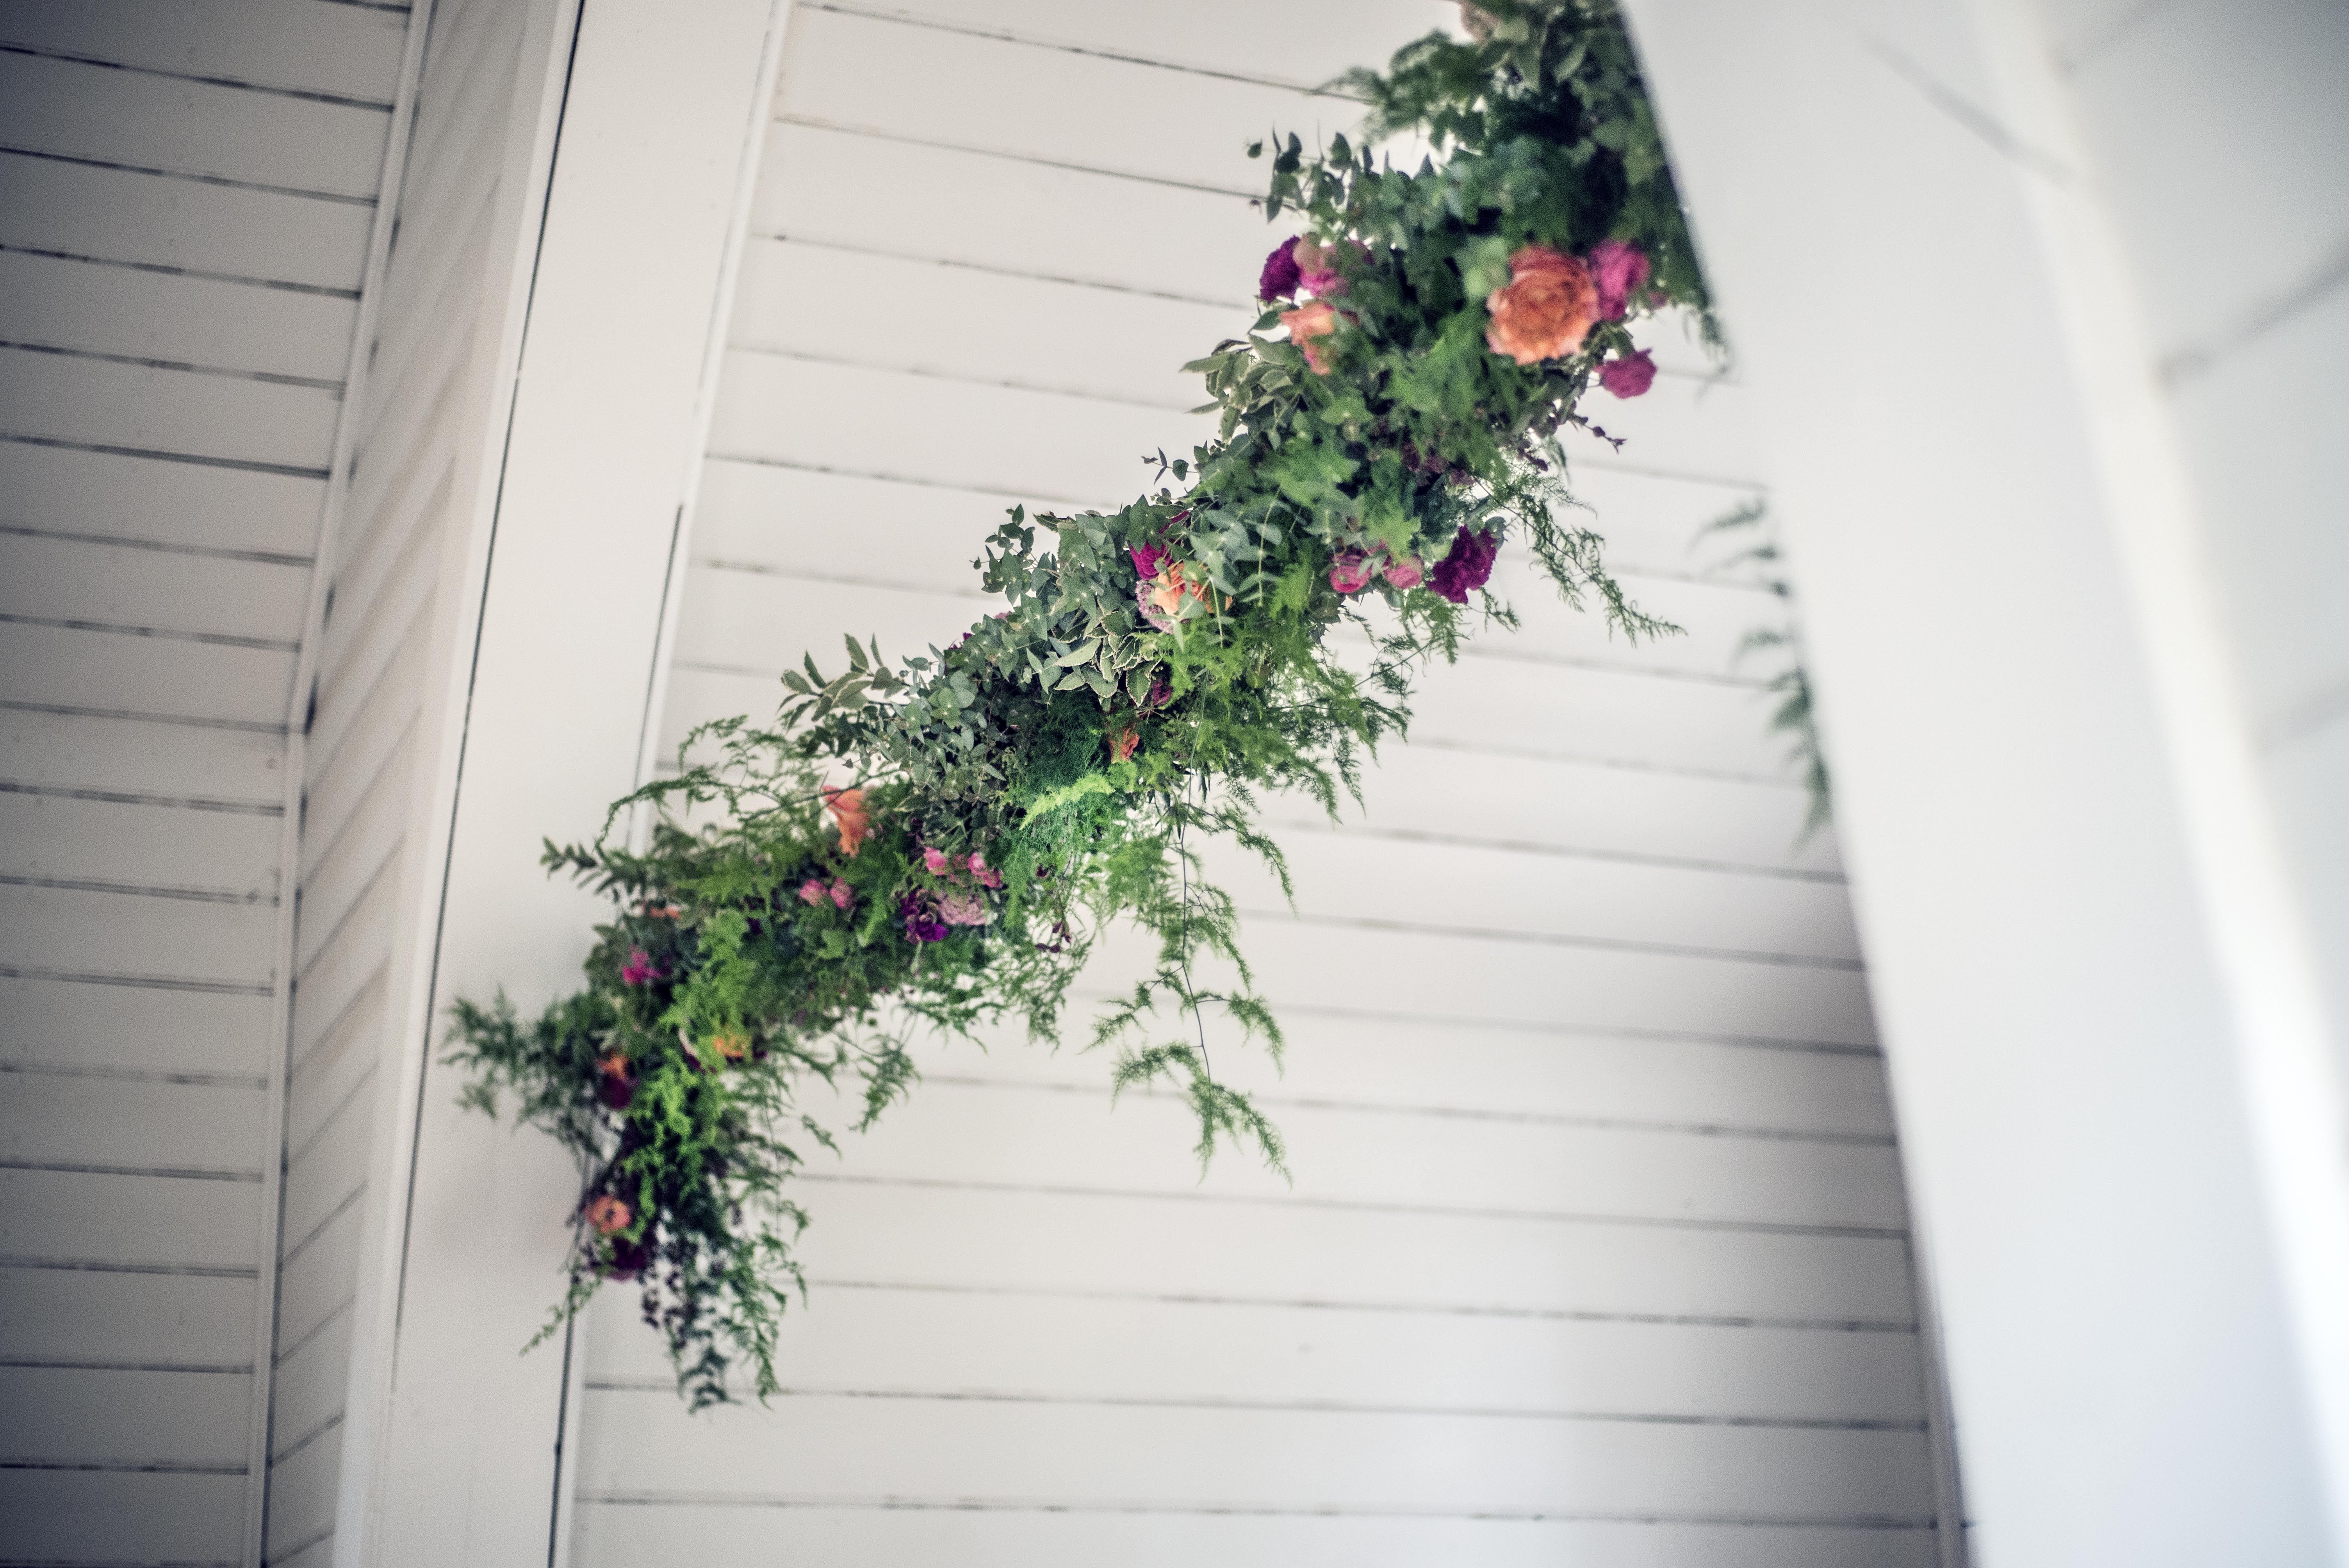 Hanging mixed floral garland